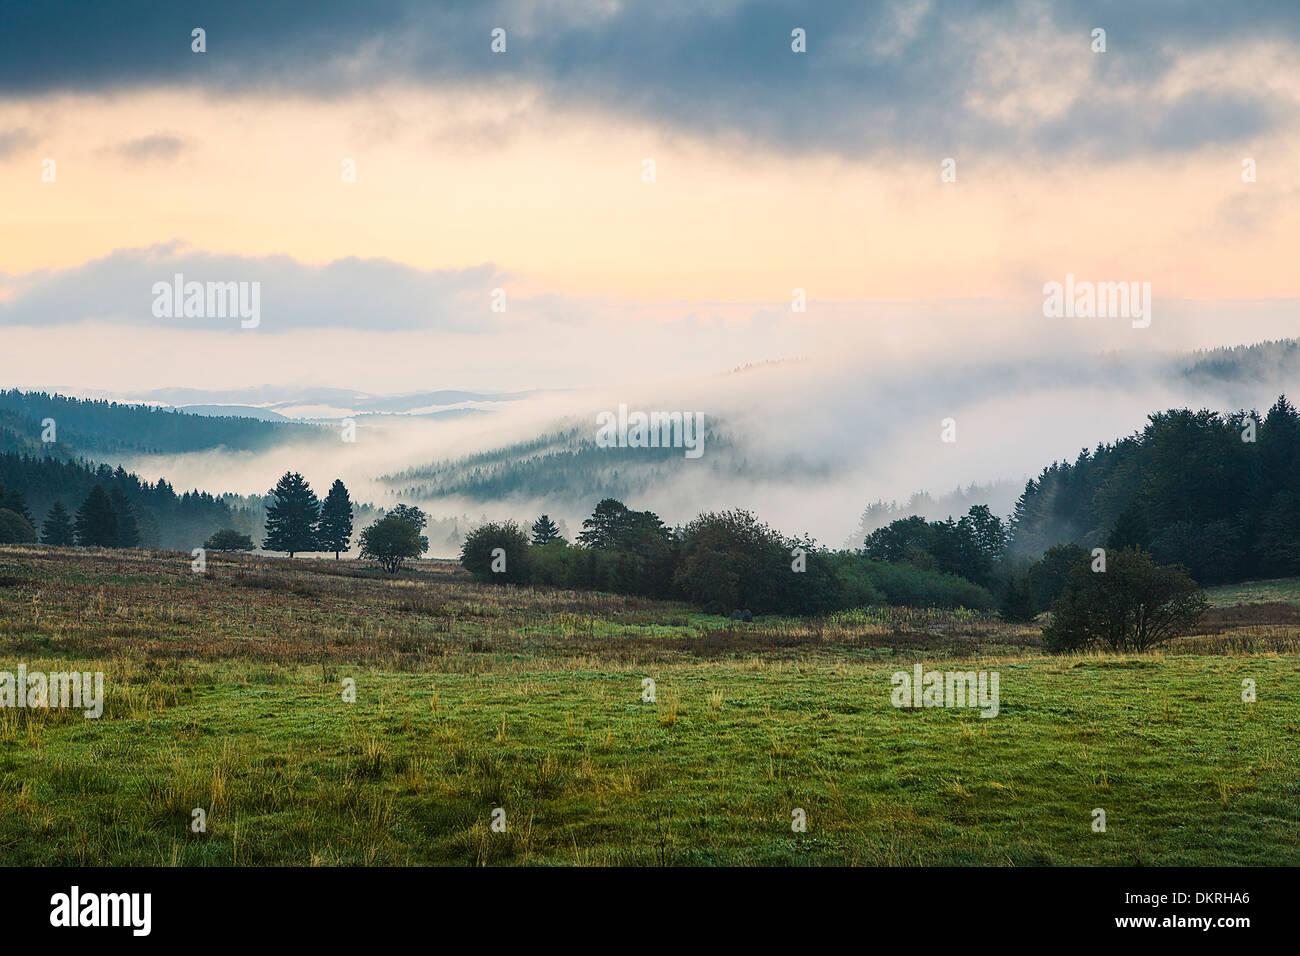 Neustadt am Rennsteig, Thuringian Forest, Ilm Kreis, Thuringia, Germany - Stock Image